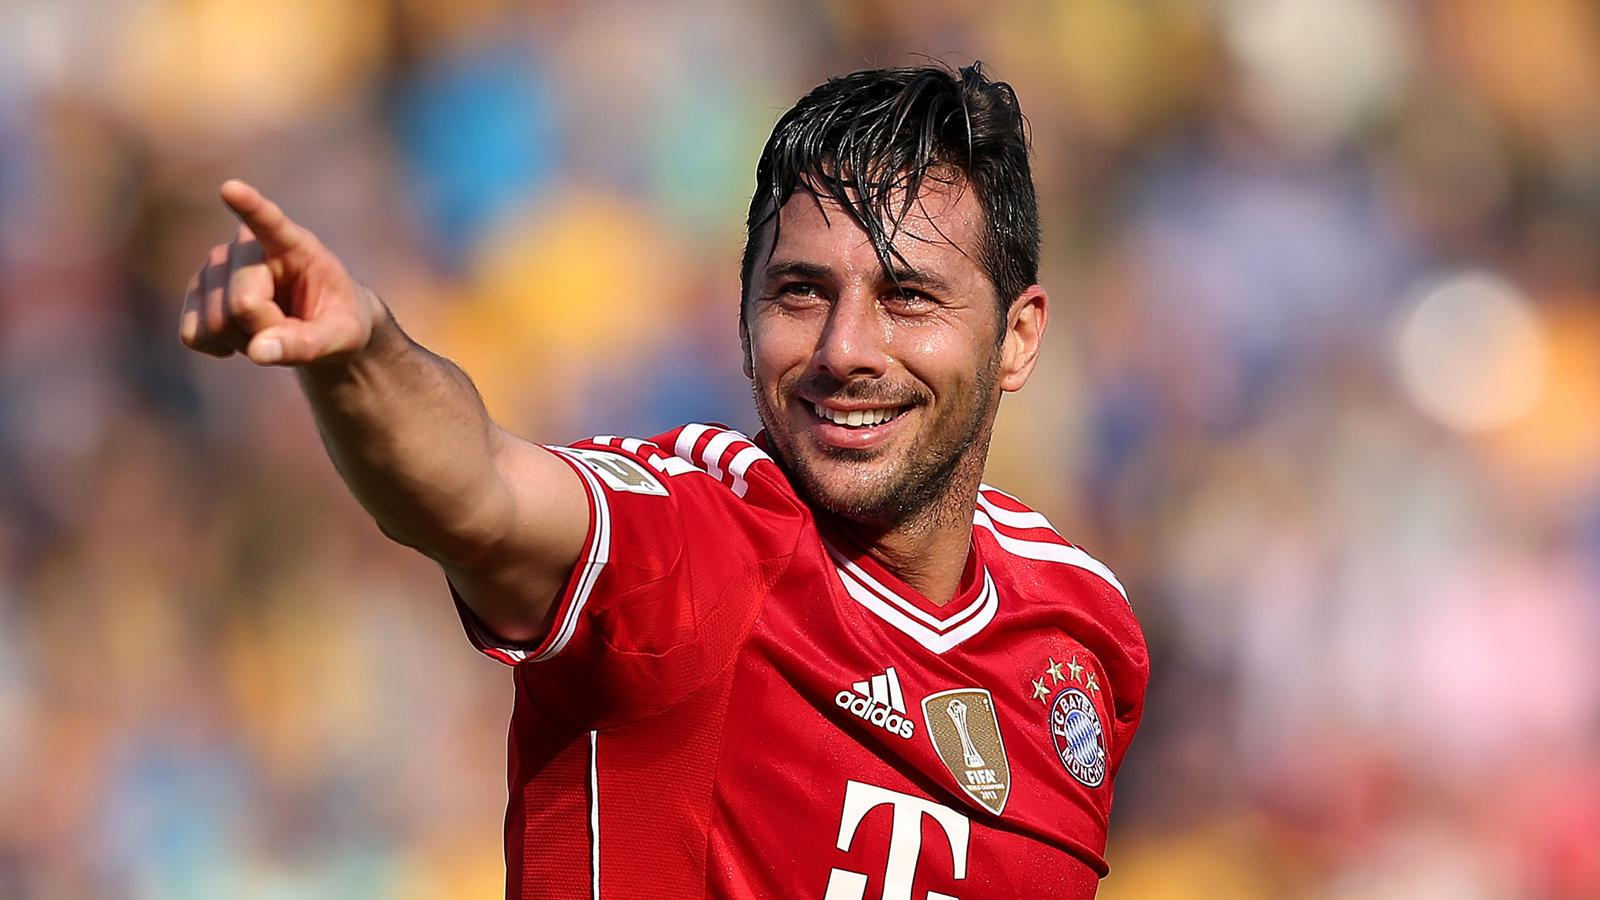 Veteran Peru striker Pizarro extends Bayern deal - Bundesliga 2013-2014 - Football - Eurosport Asia